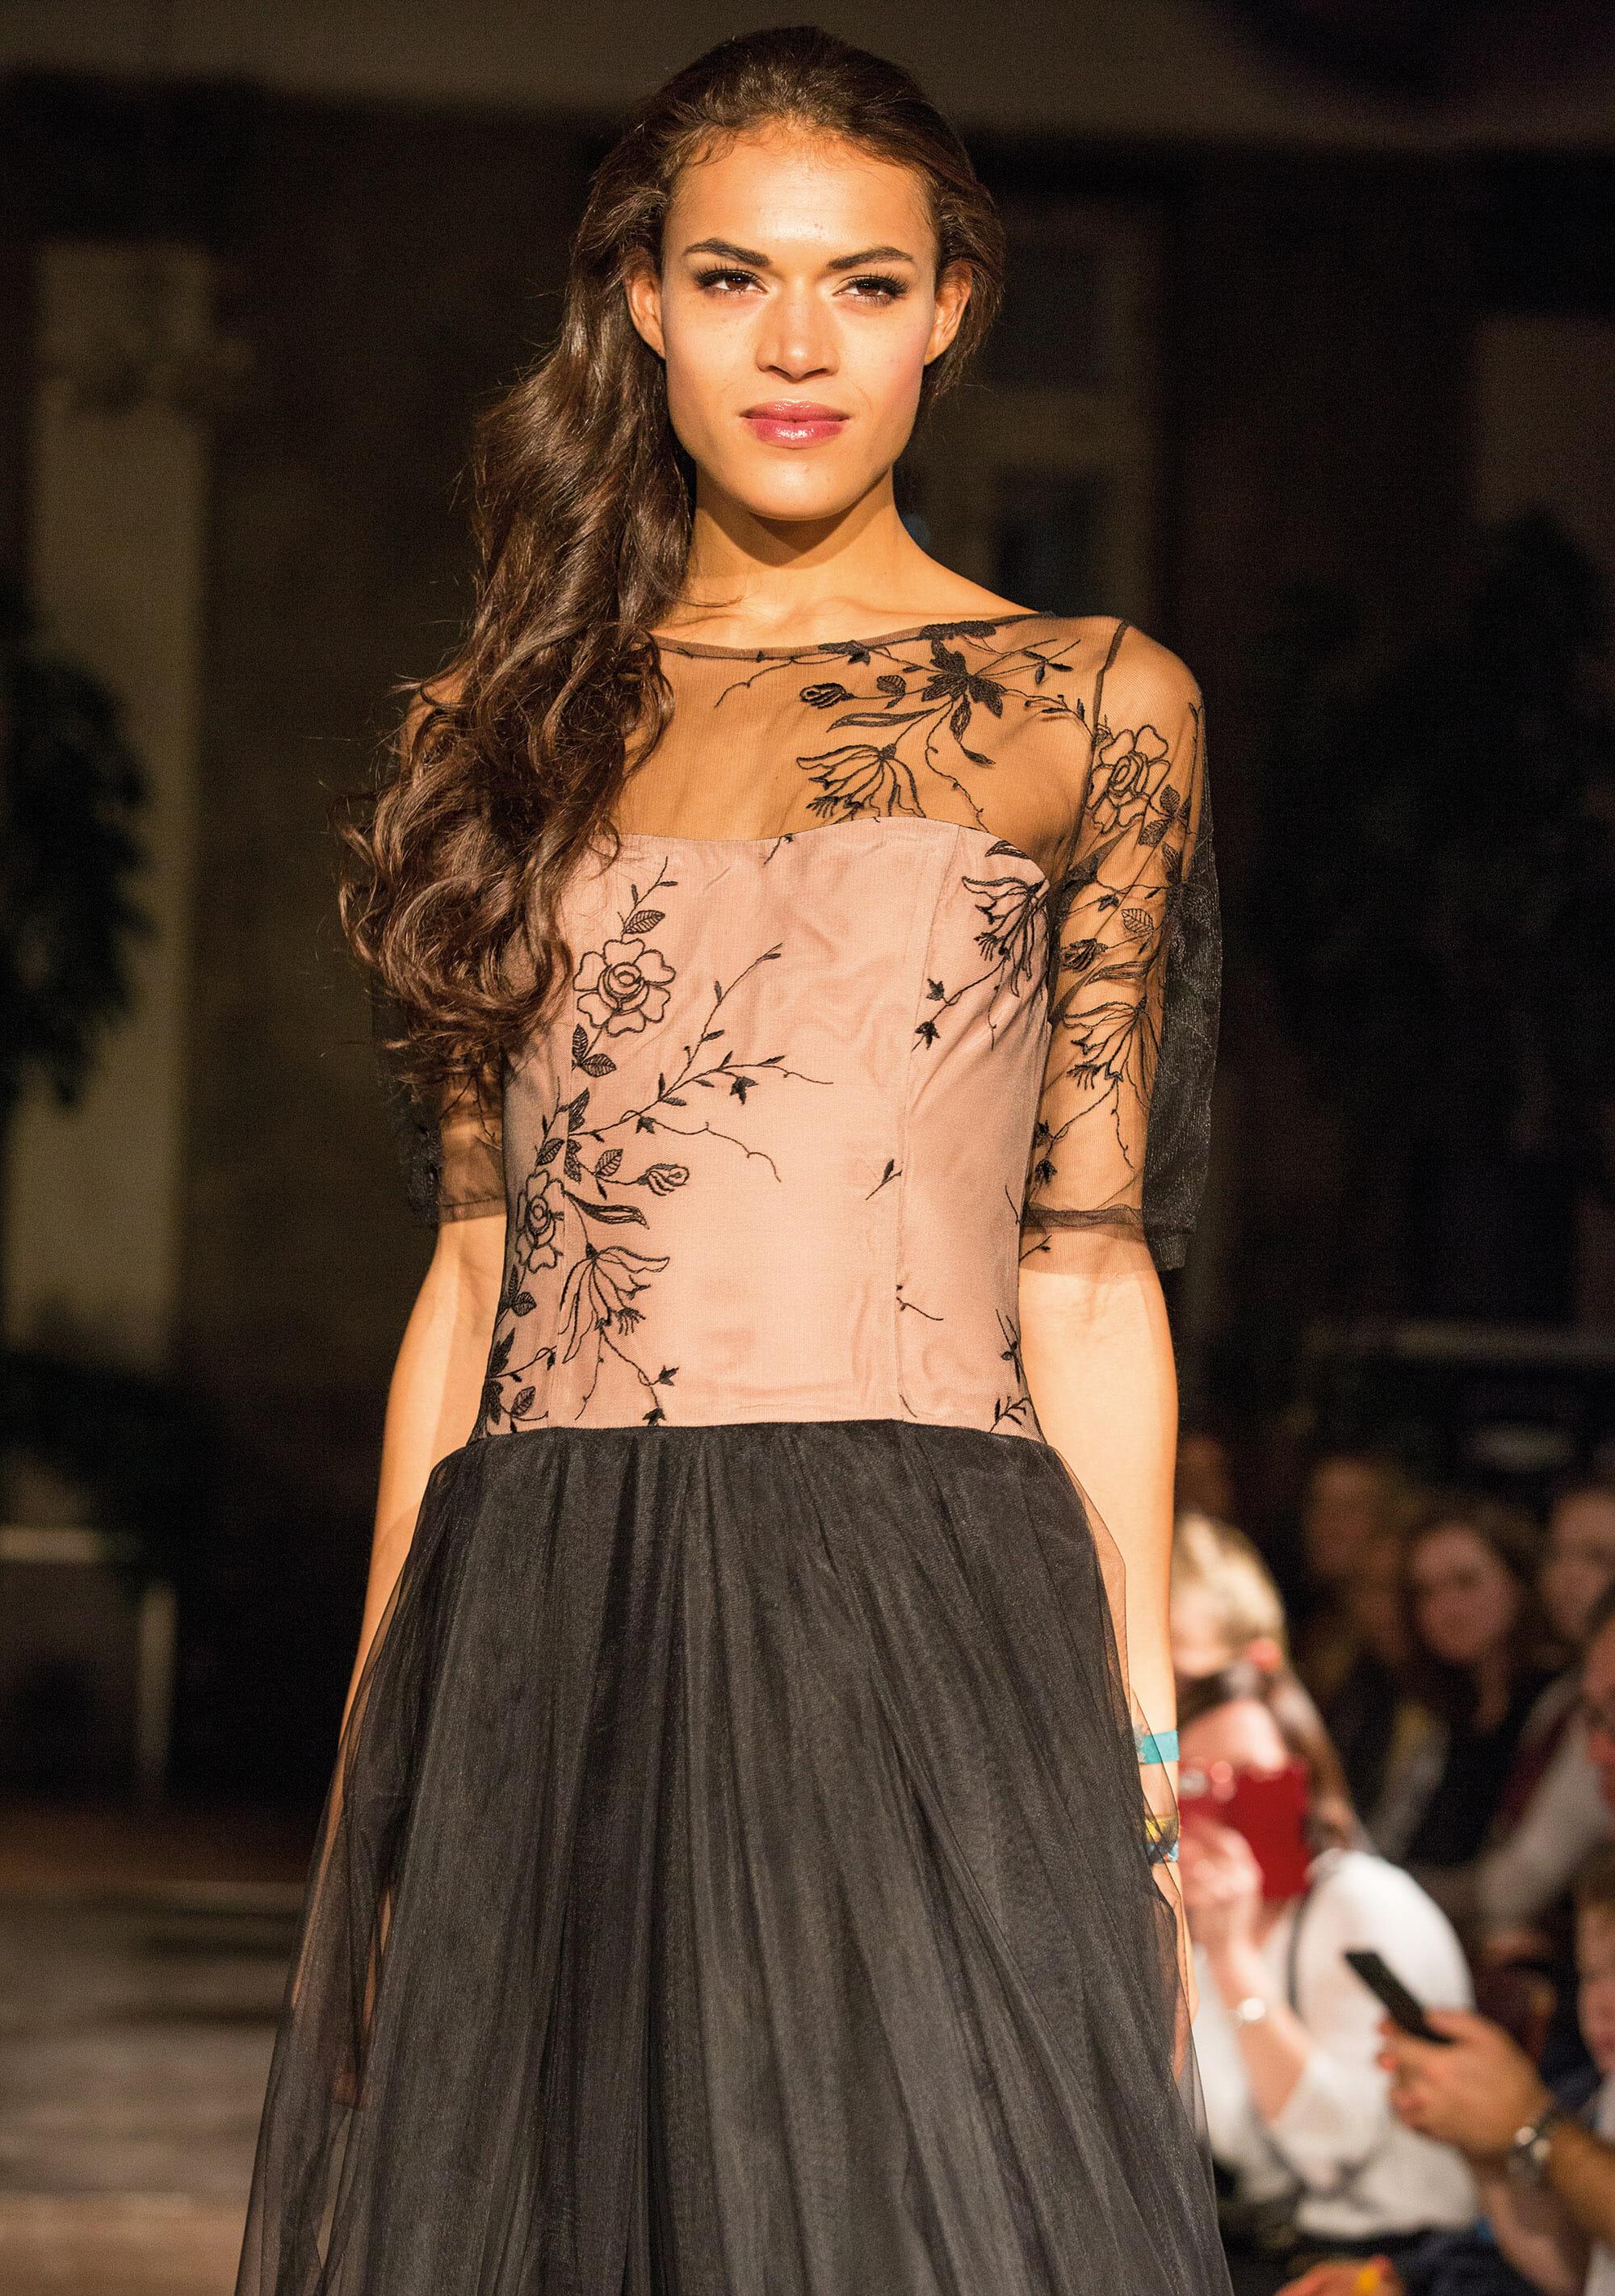 ANNE WOLF Abendkleider Modell: Gundel